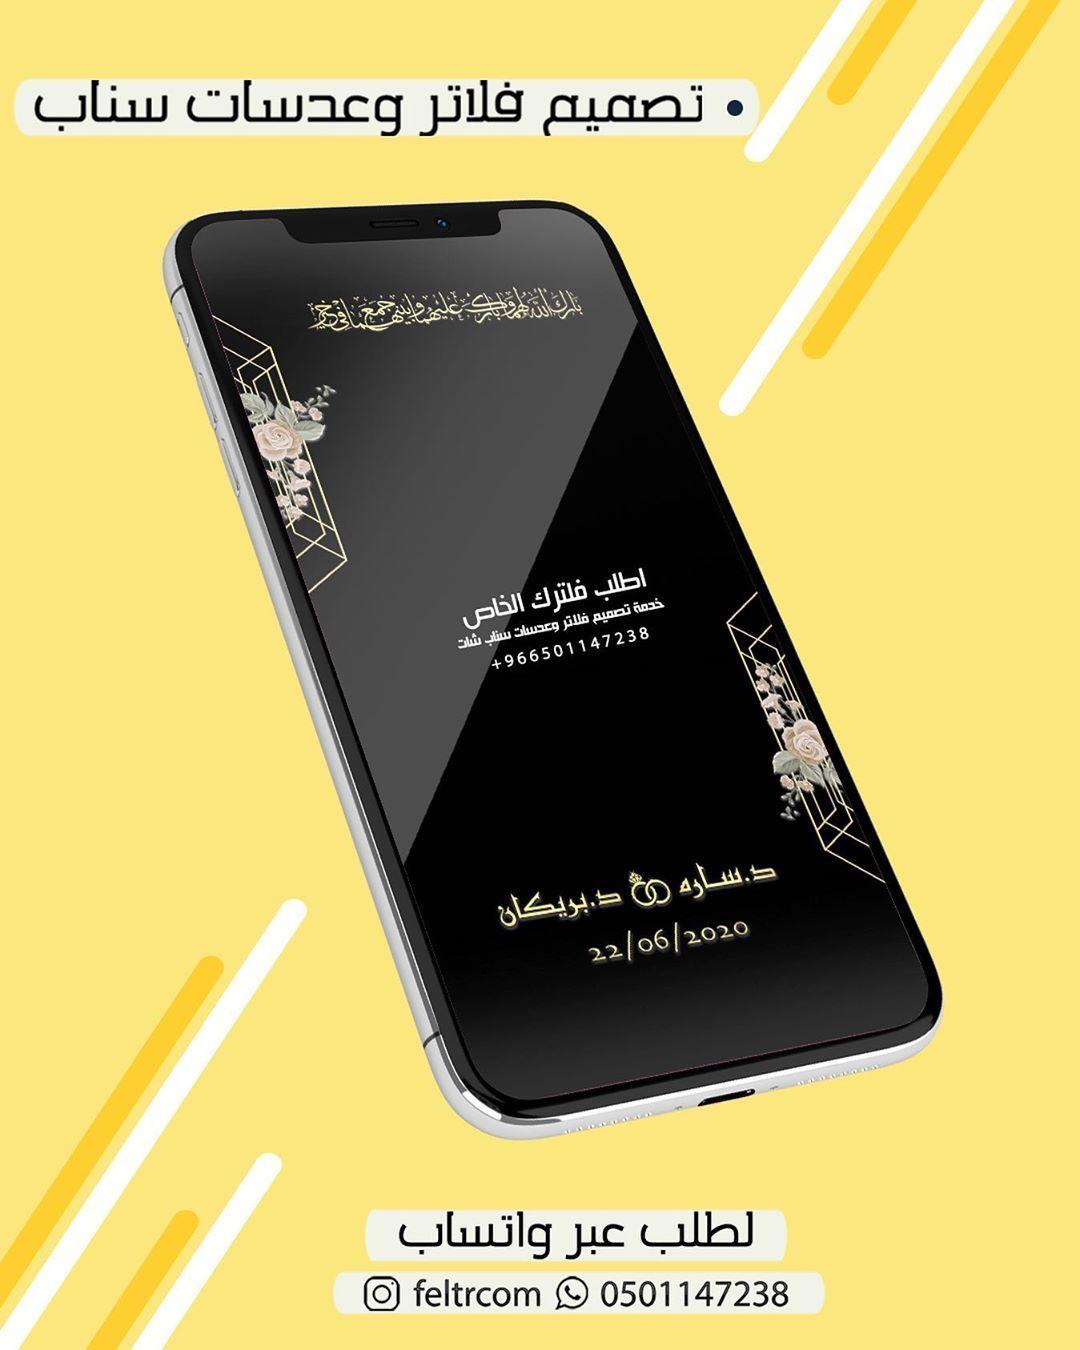 فلاتر و عدسات سناب Feltrcom Instagram Photos And Videos Whatsapp Message Messages Samsung Galaxy Phone